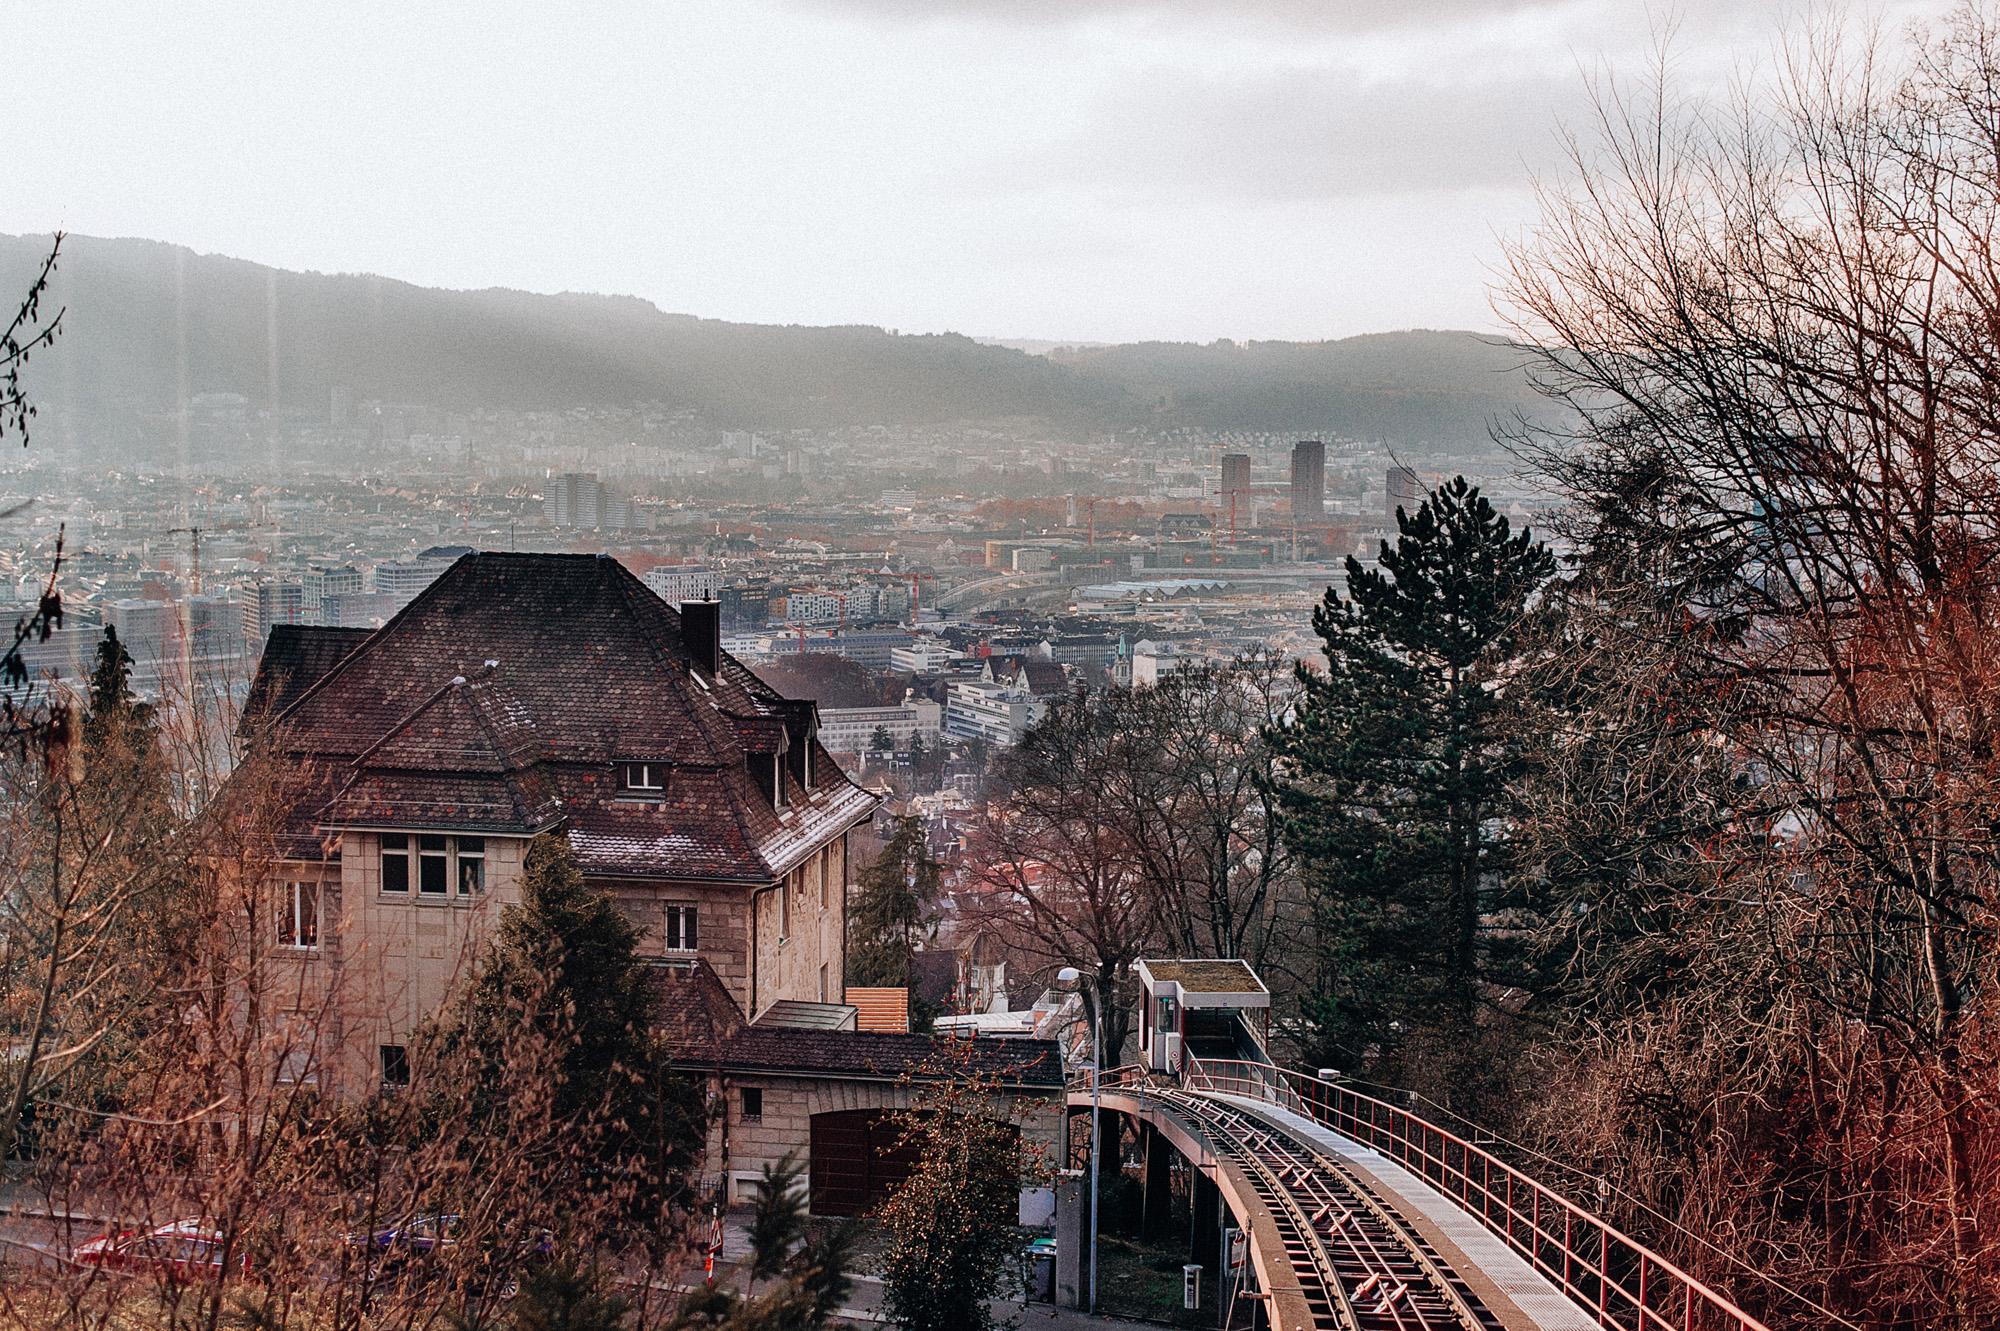 Beautiful view from Zurichberg